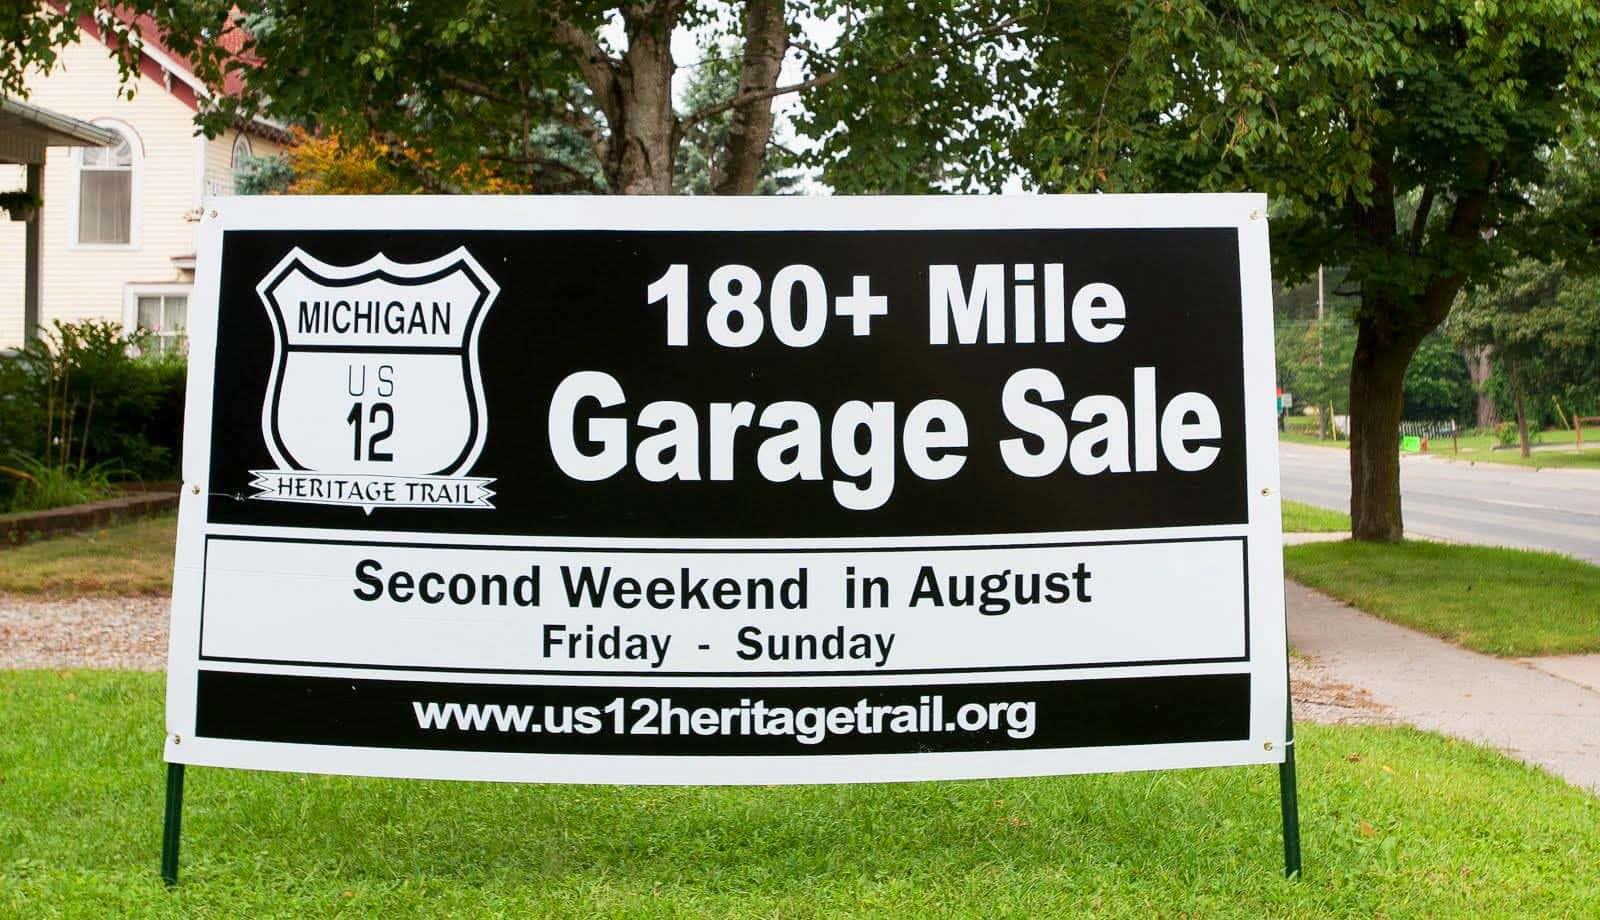 Michigan S Longest Garage Sale Along Us 12 Coming Aug 9 11 Moody